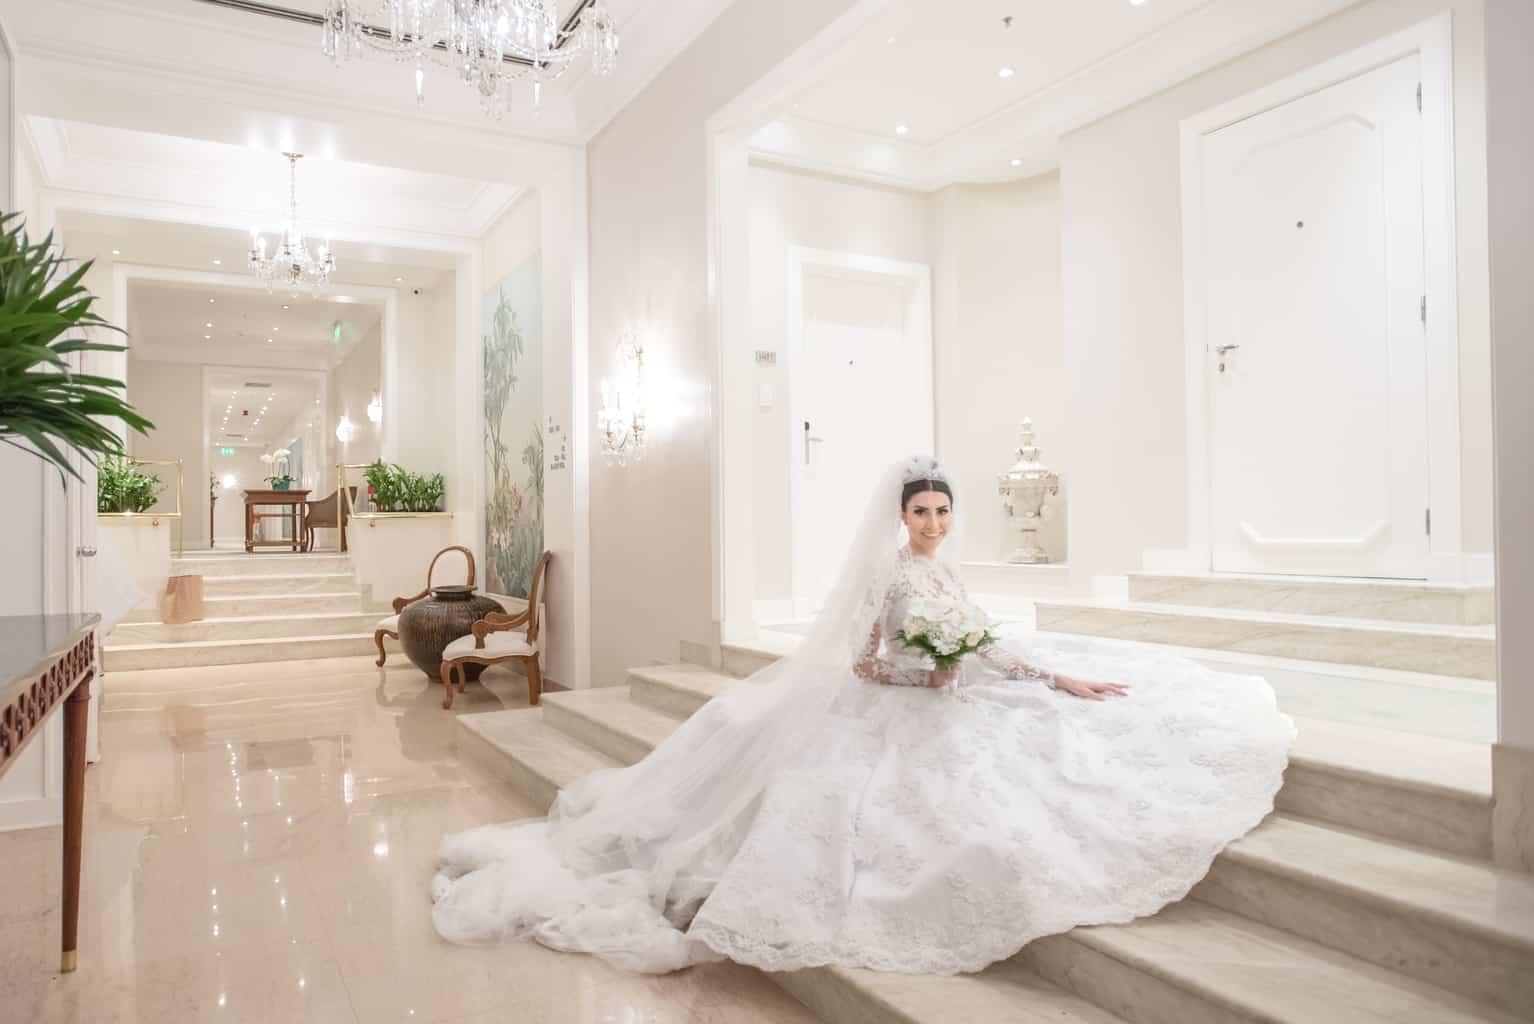 casamento-Patricia-e-Thiago-Copacabana-Palace-Marcelo-Hicho-Paula-Rocha-Marina-Fava-Making-Of0370-Patricia-e-Thiago-WAL_2942